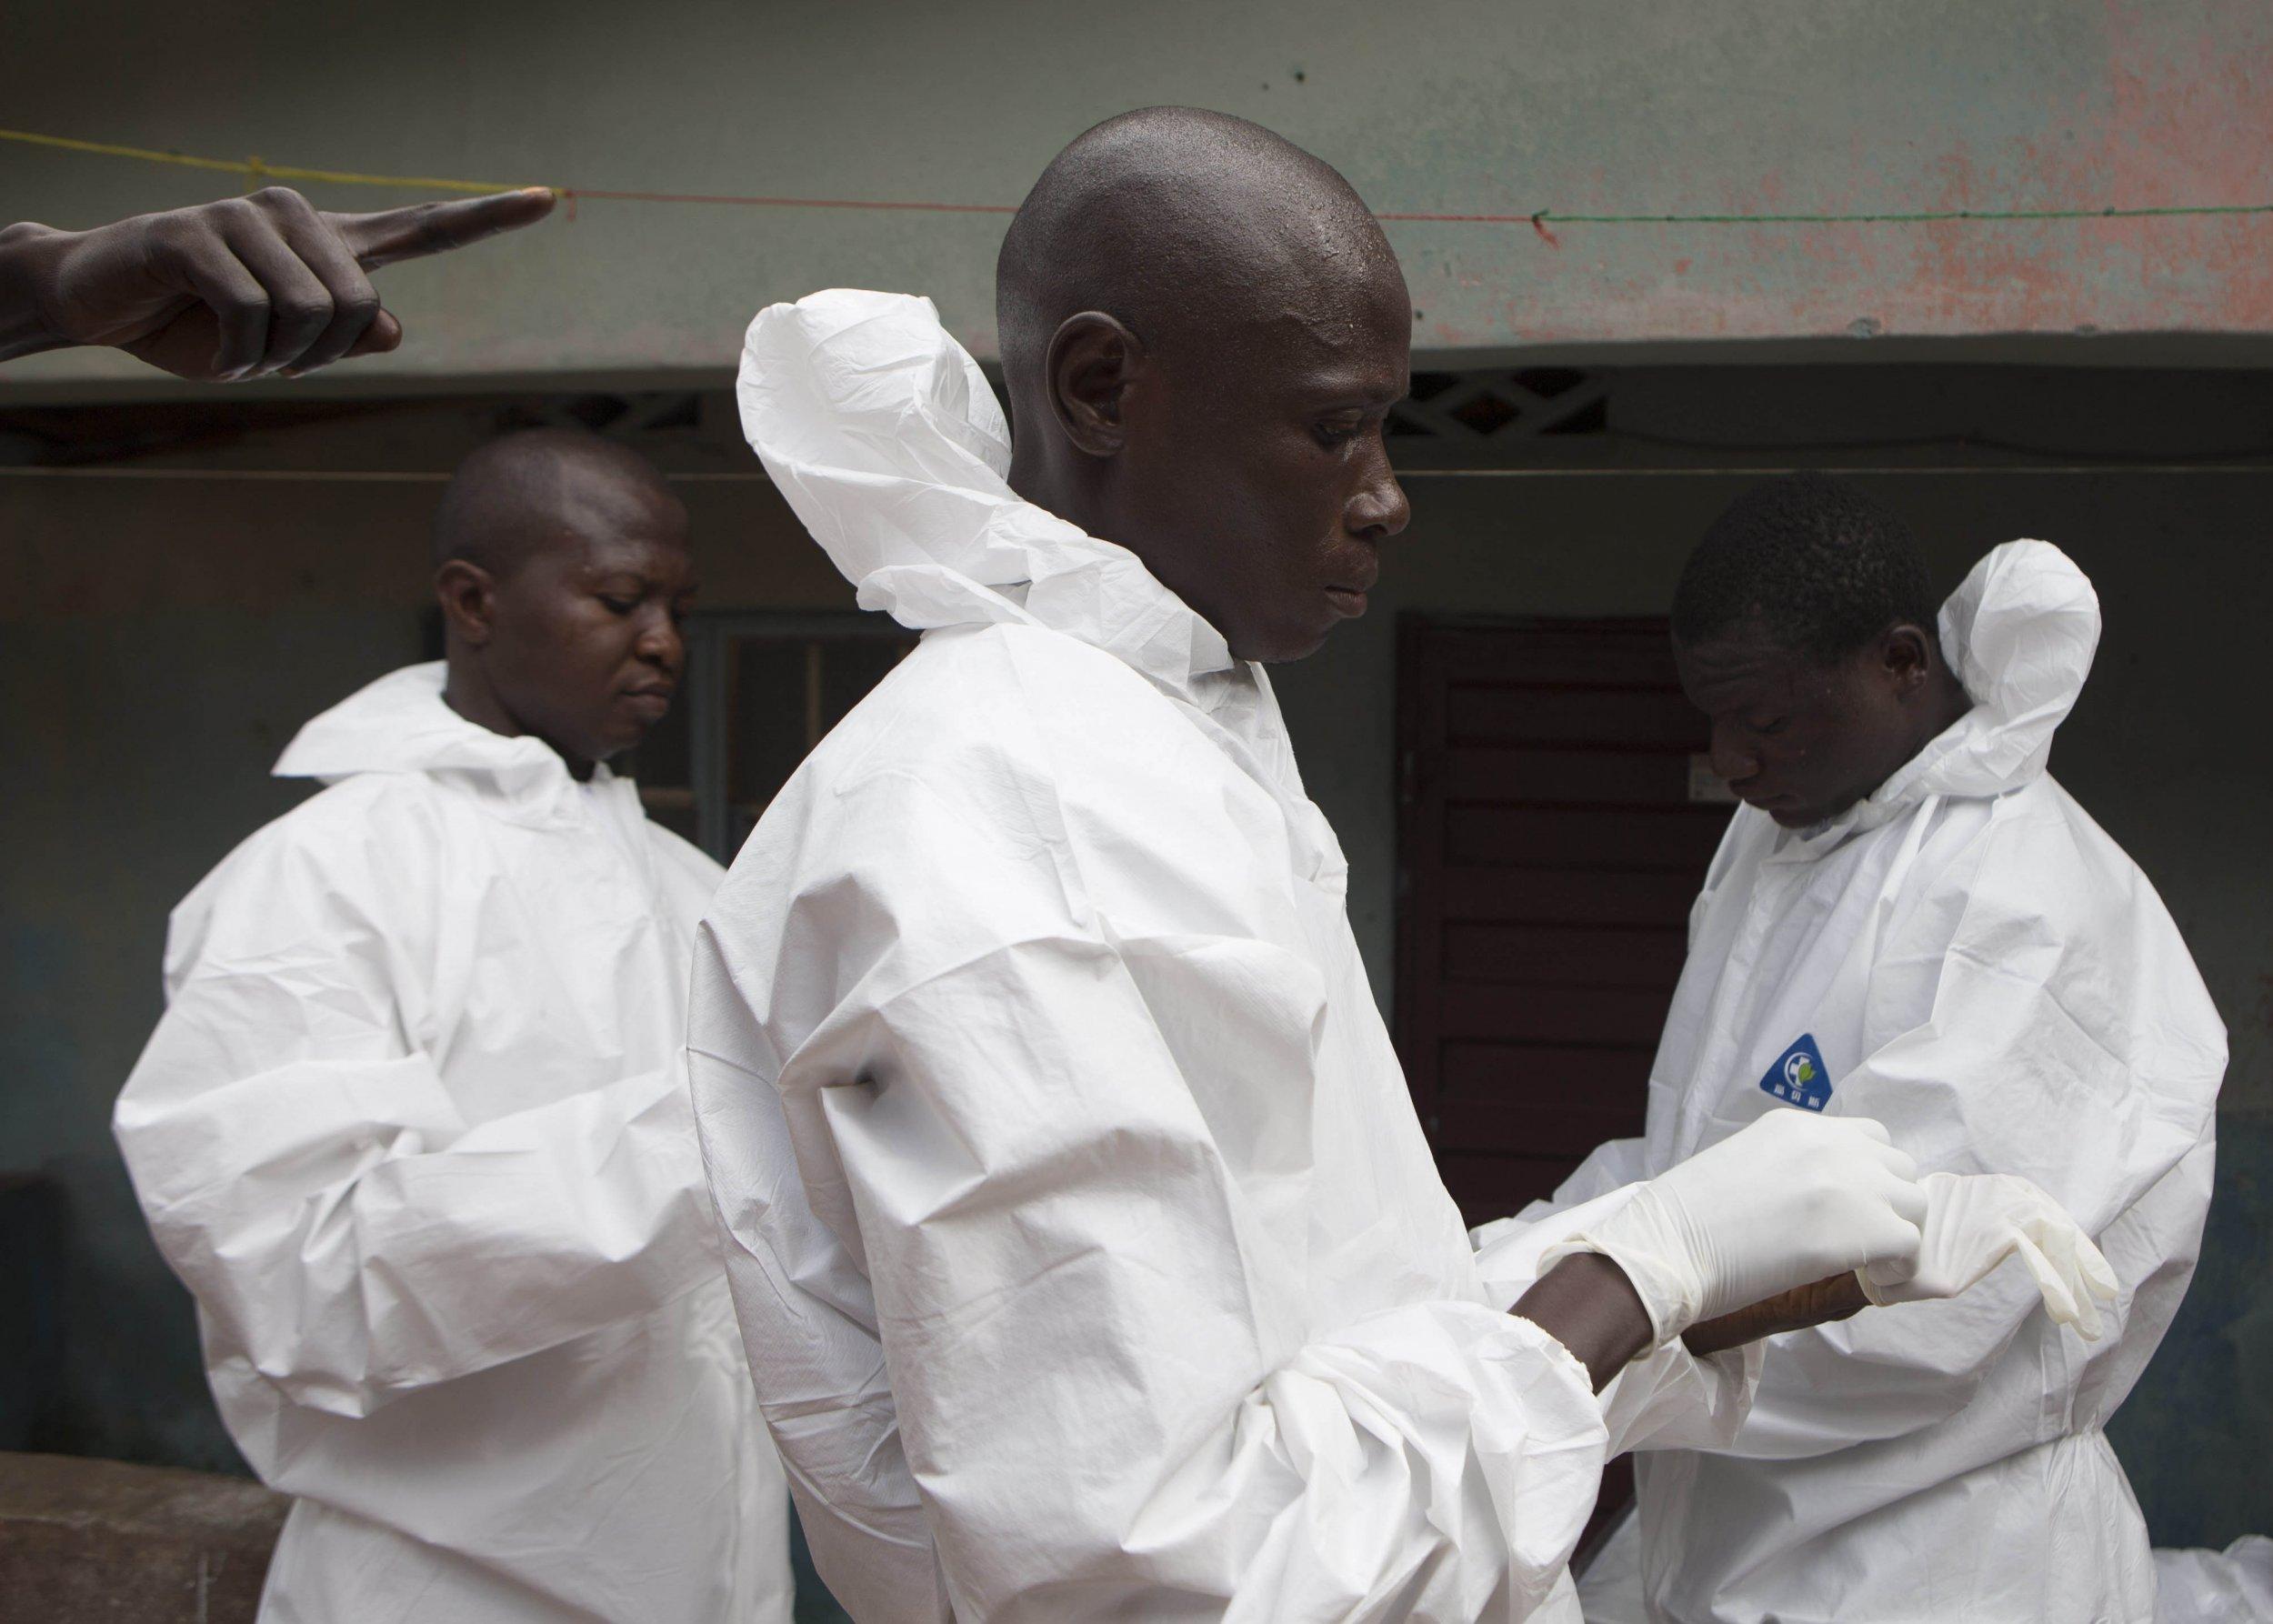 http://s.newsweek.com/sites/www.newsweek.com/files/styles/headline/public/2014/11/27/ebola-workers.jpg?itok=bezc_9ys